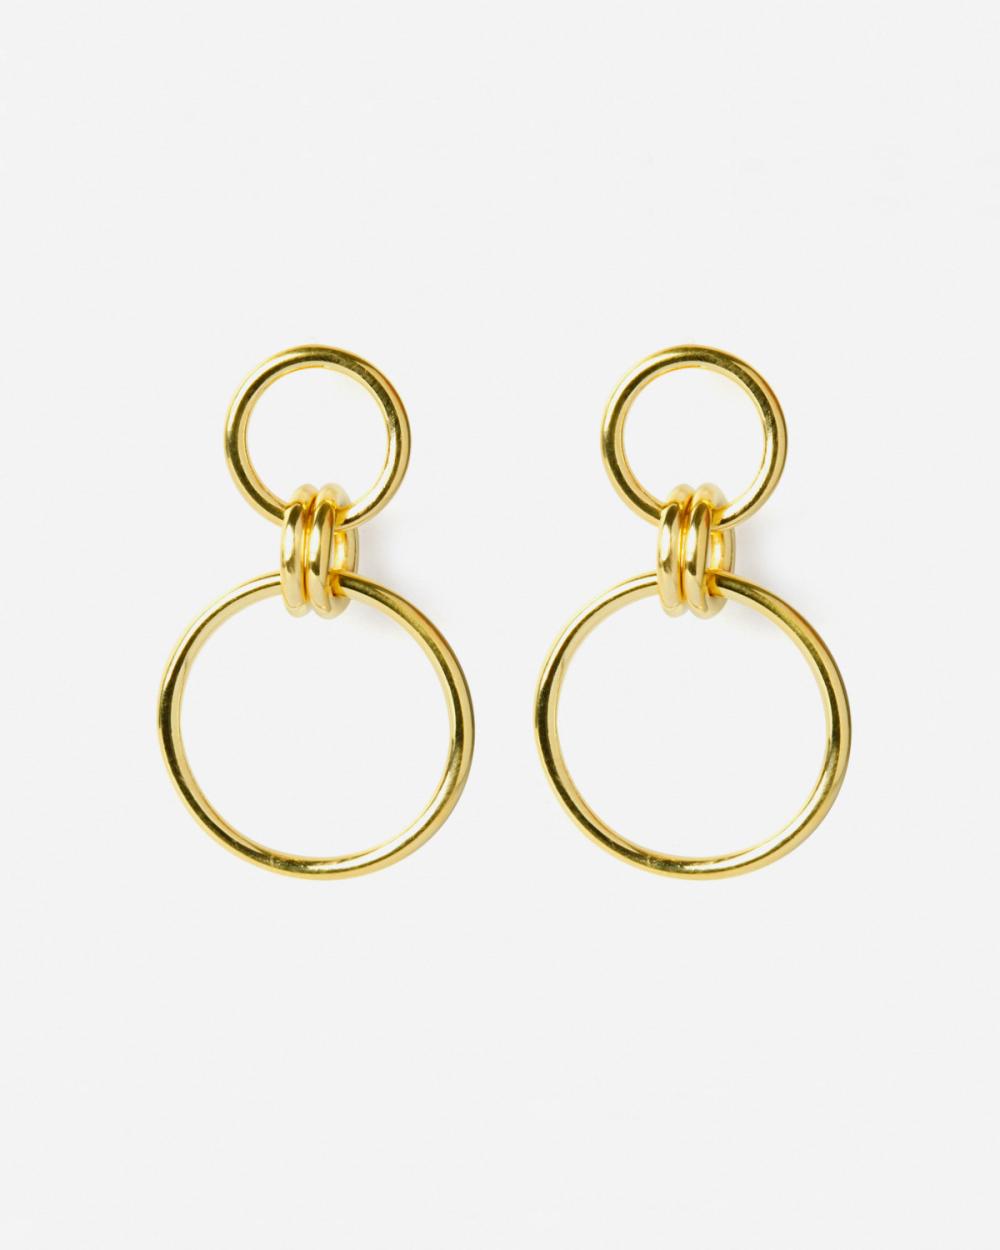 Earrings YELLOW GOLD OMICRO EARRINGS NOVE25